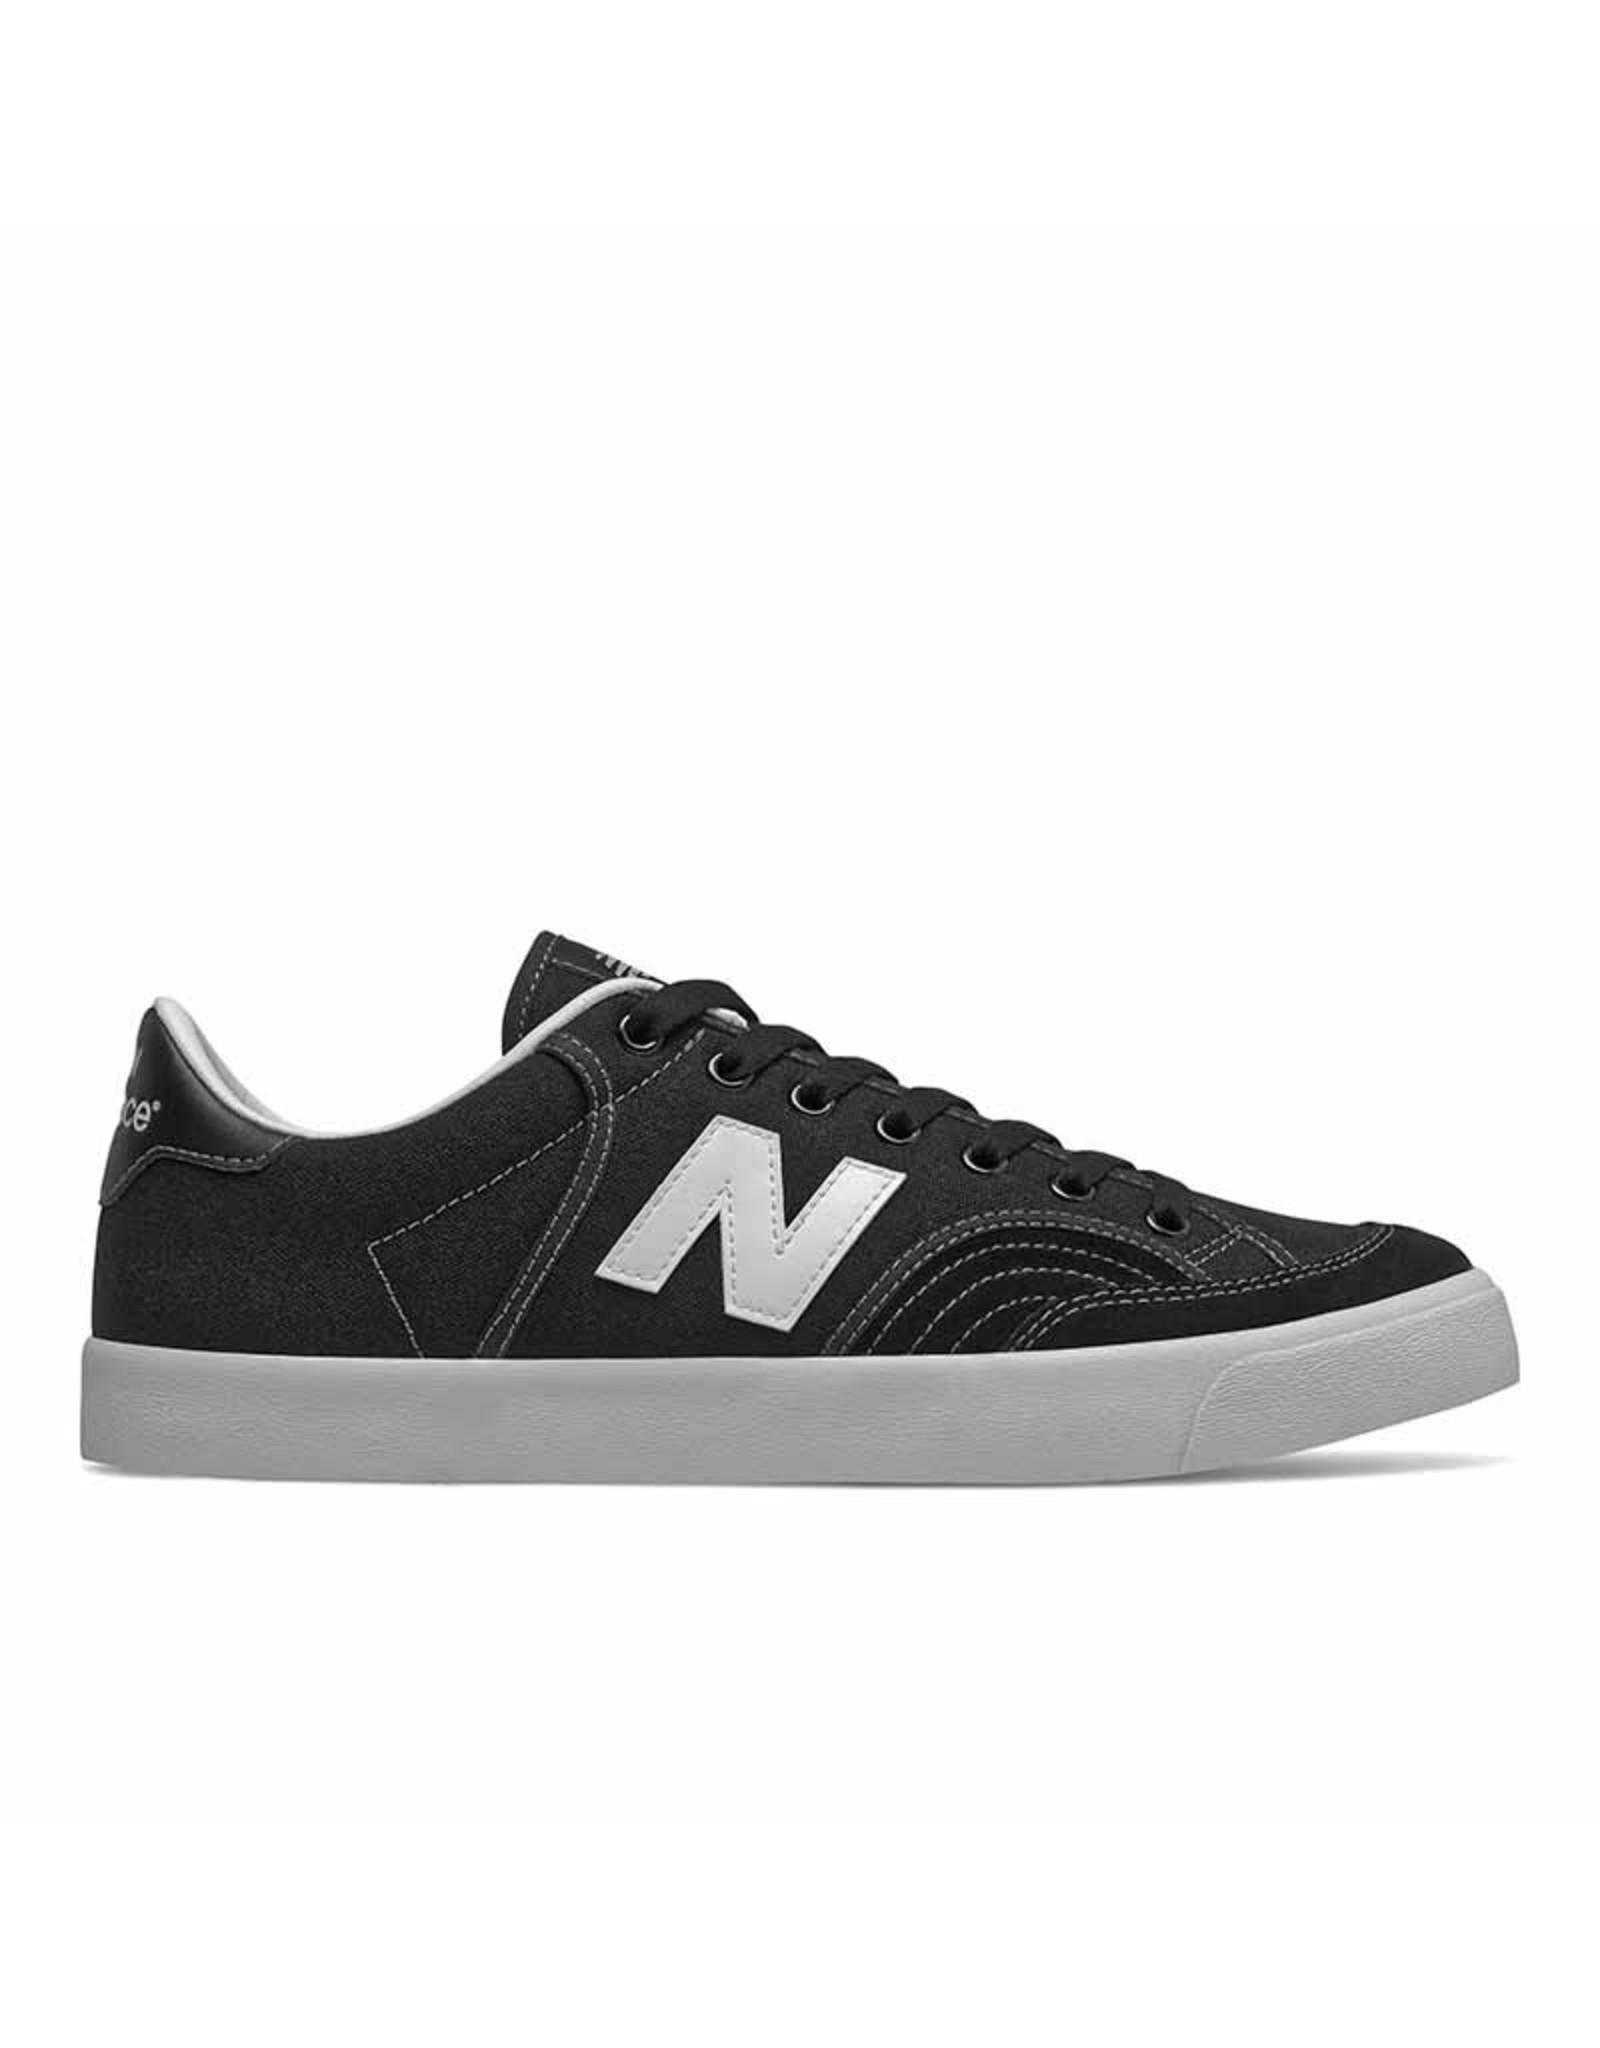 NEW BALANCE NEW BALANCE - 212 - BLACK/WHITE